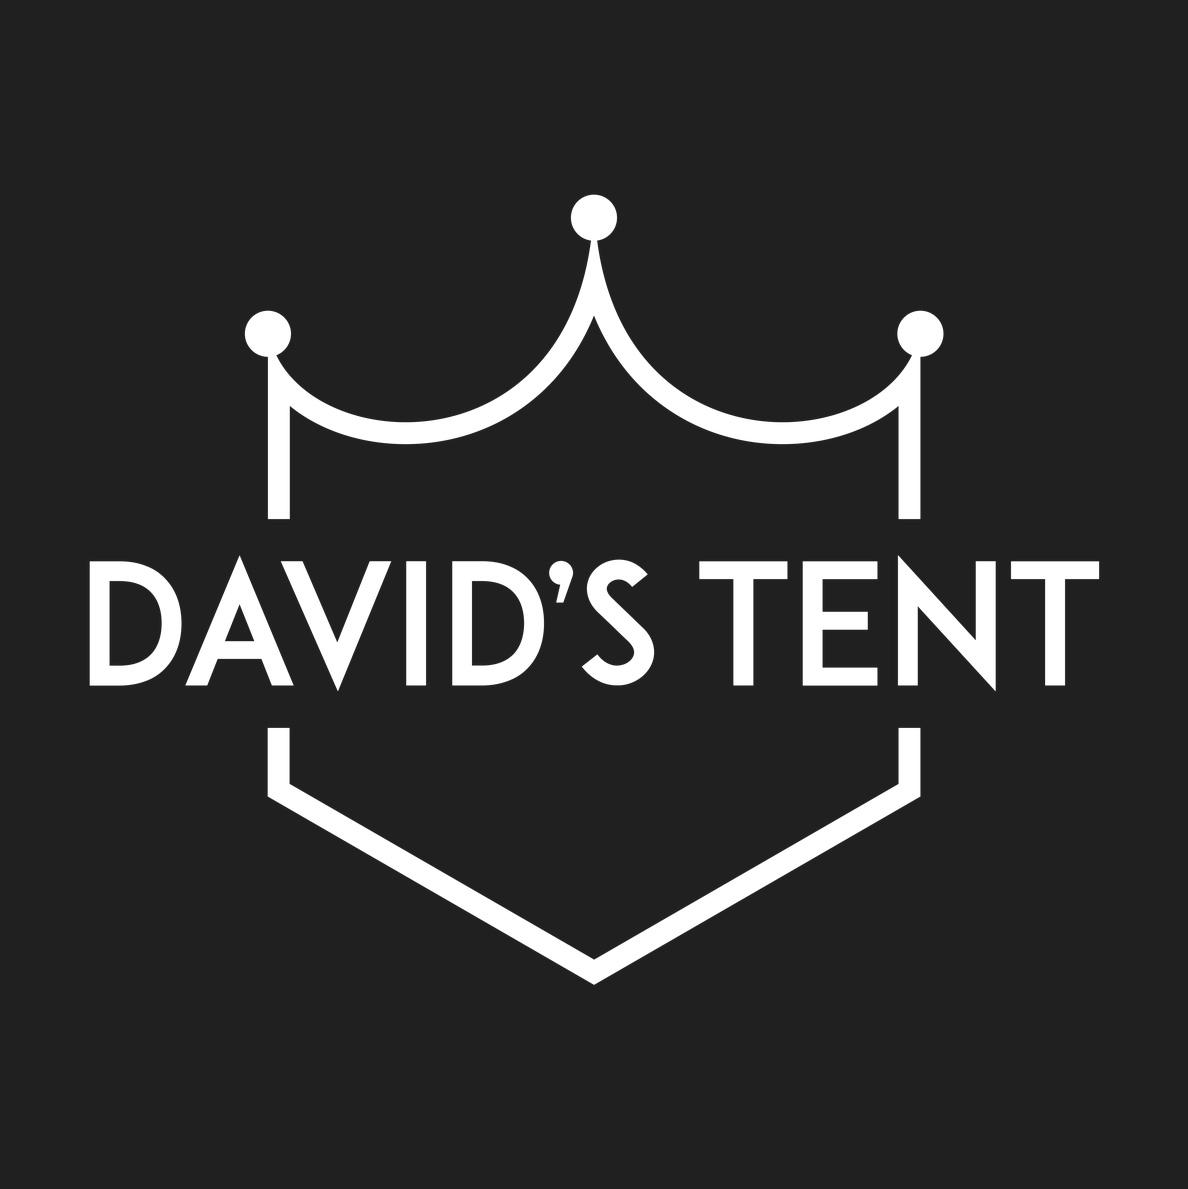 davids_tent.jpg